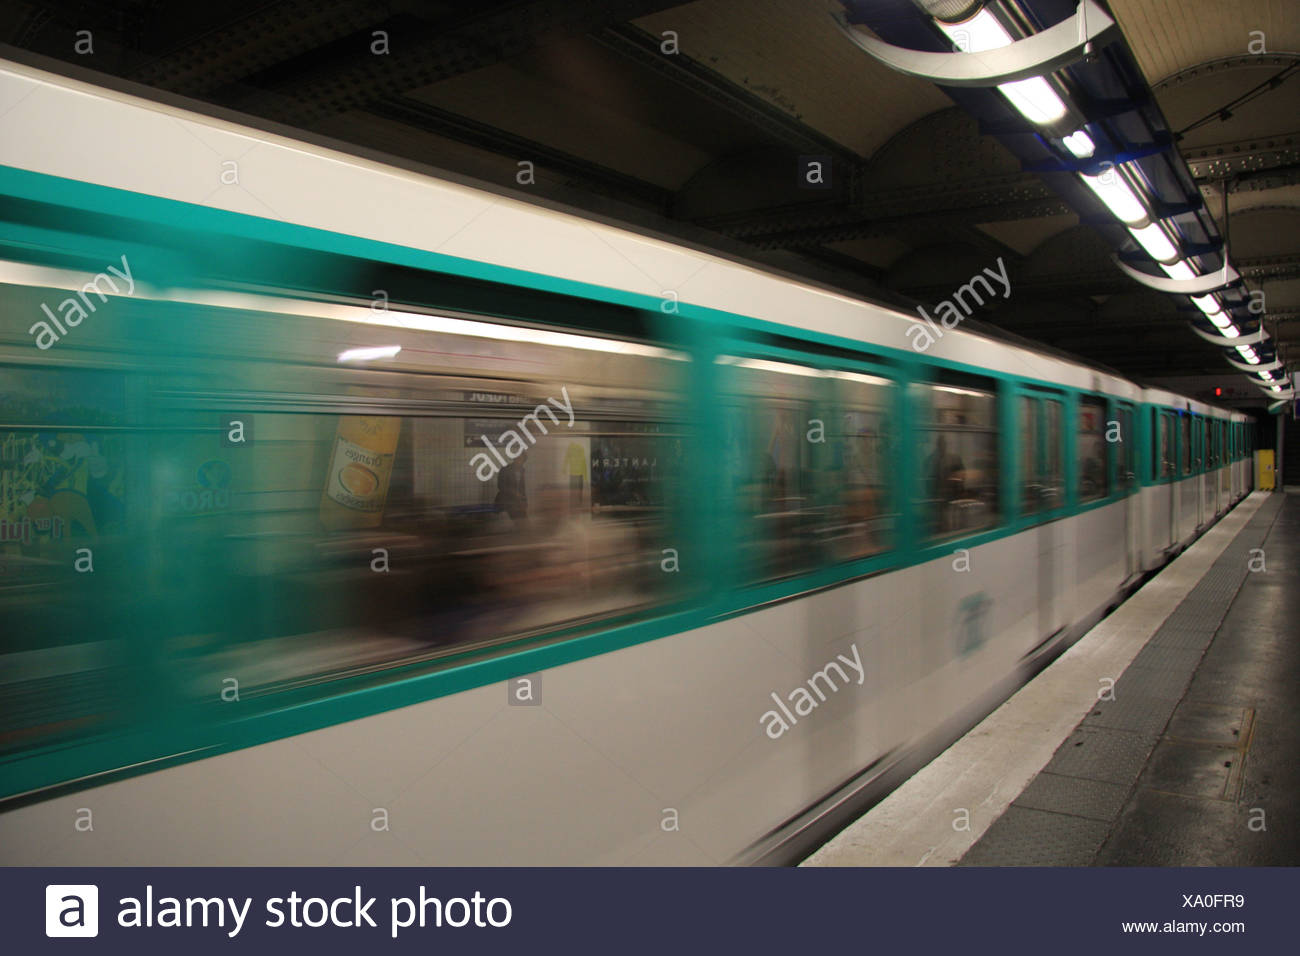 Paris, metro, subway, underground, Reaumur Sebastopol, train, entrance, transport, publicly, blurs - Stock Image